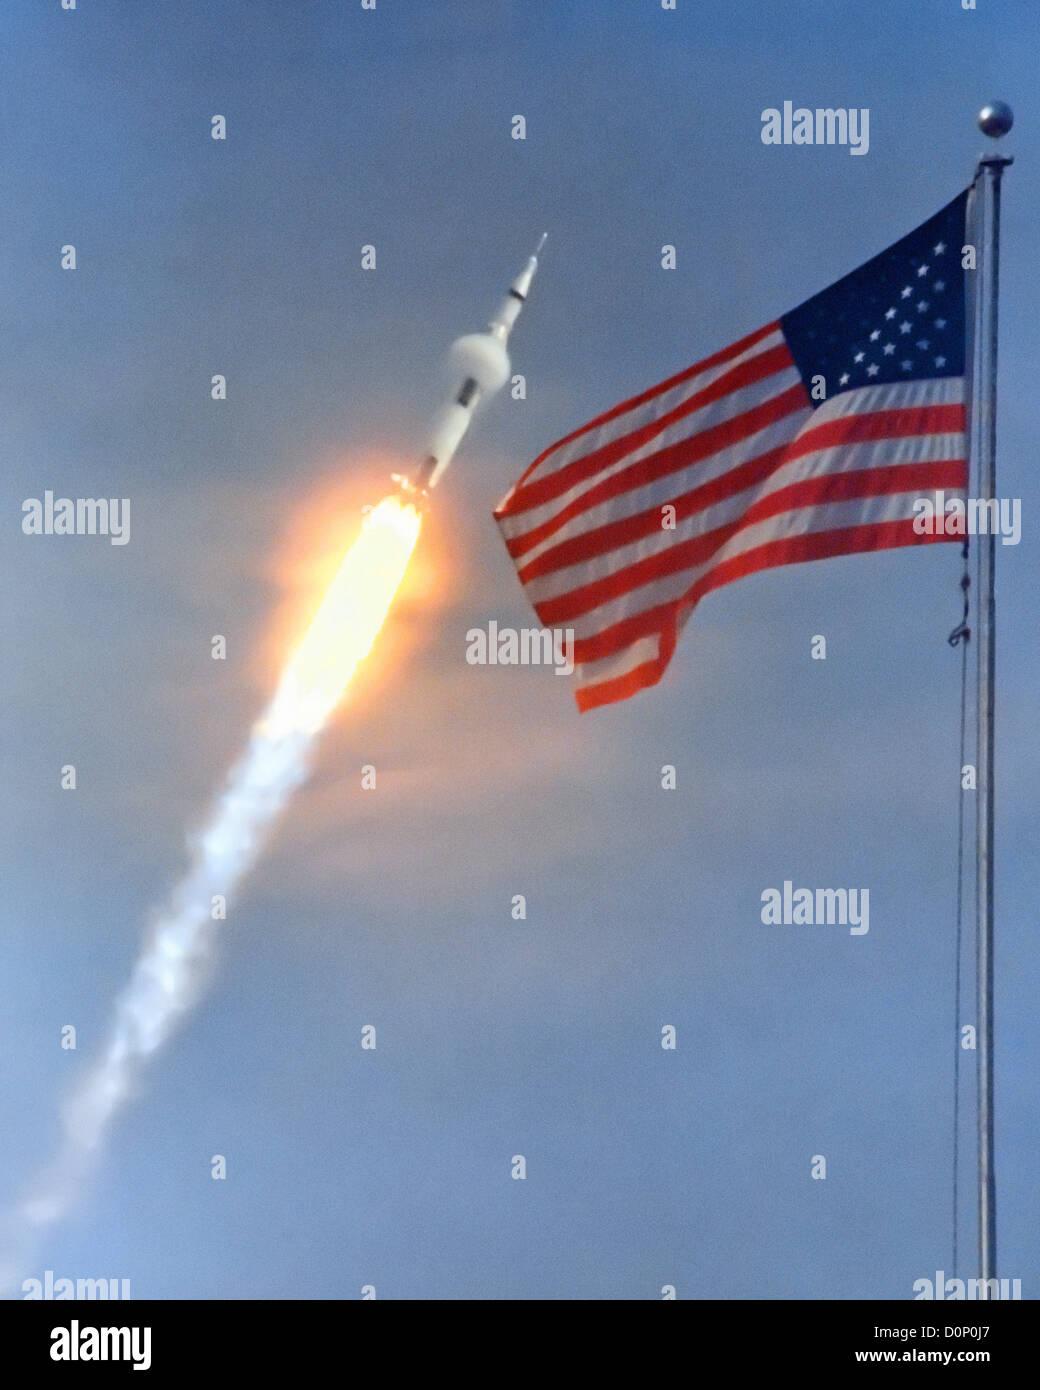 Apollo 11 Launches Past American Flag - Stock Image